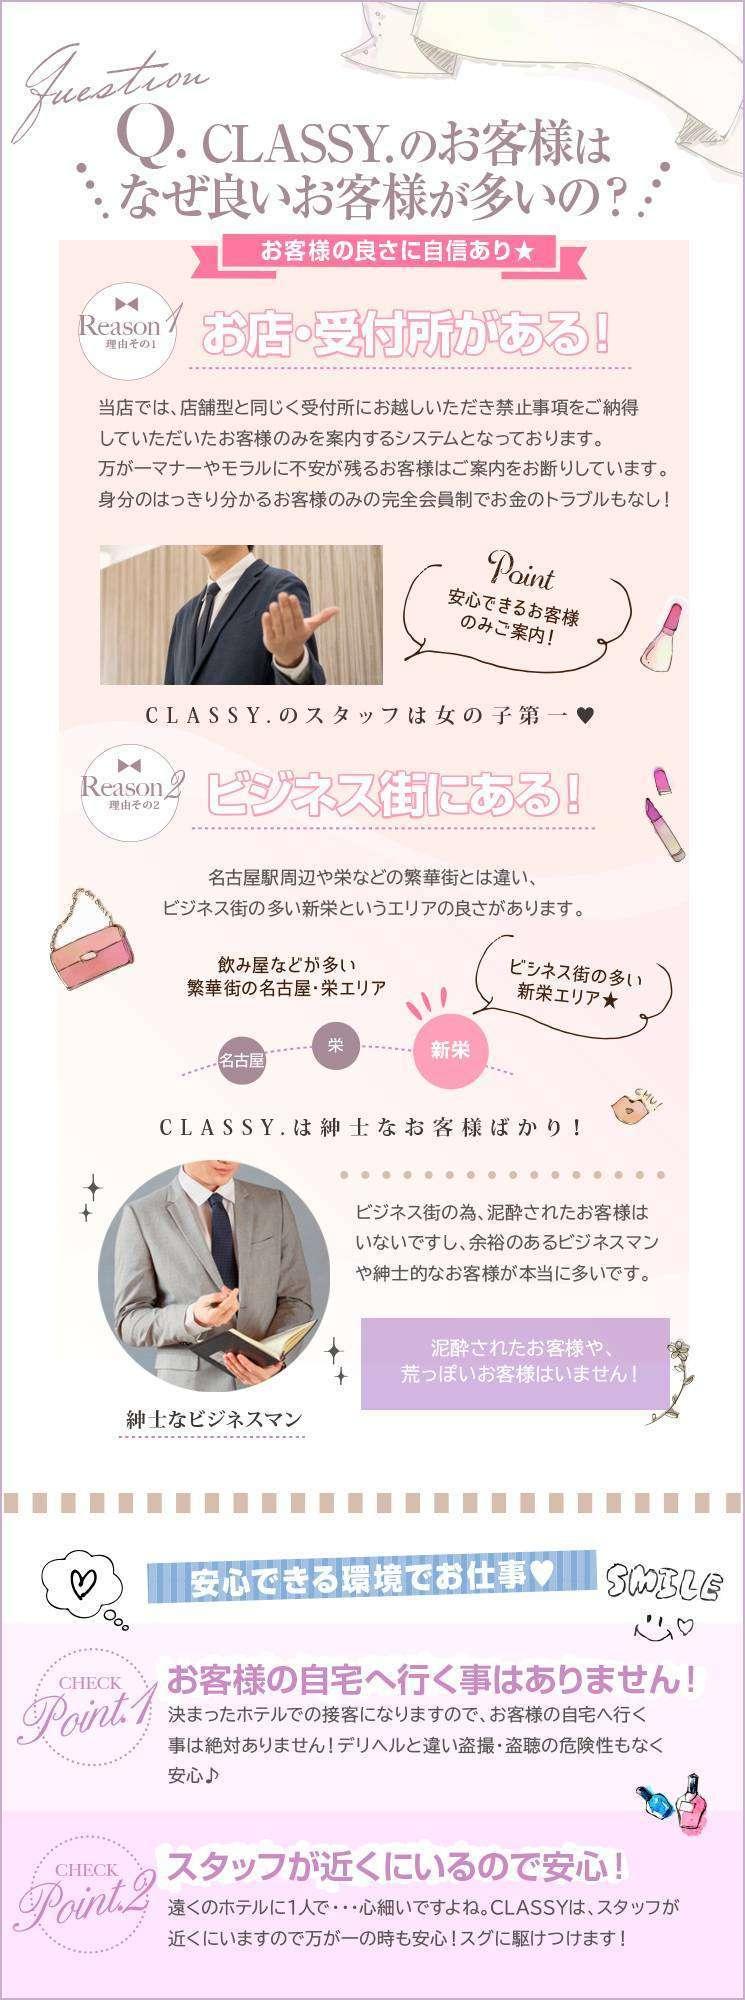 Classy名古屋○○さん